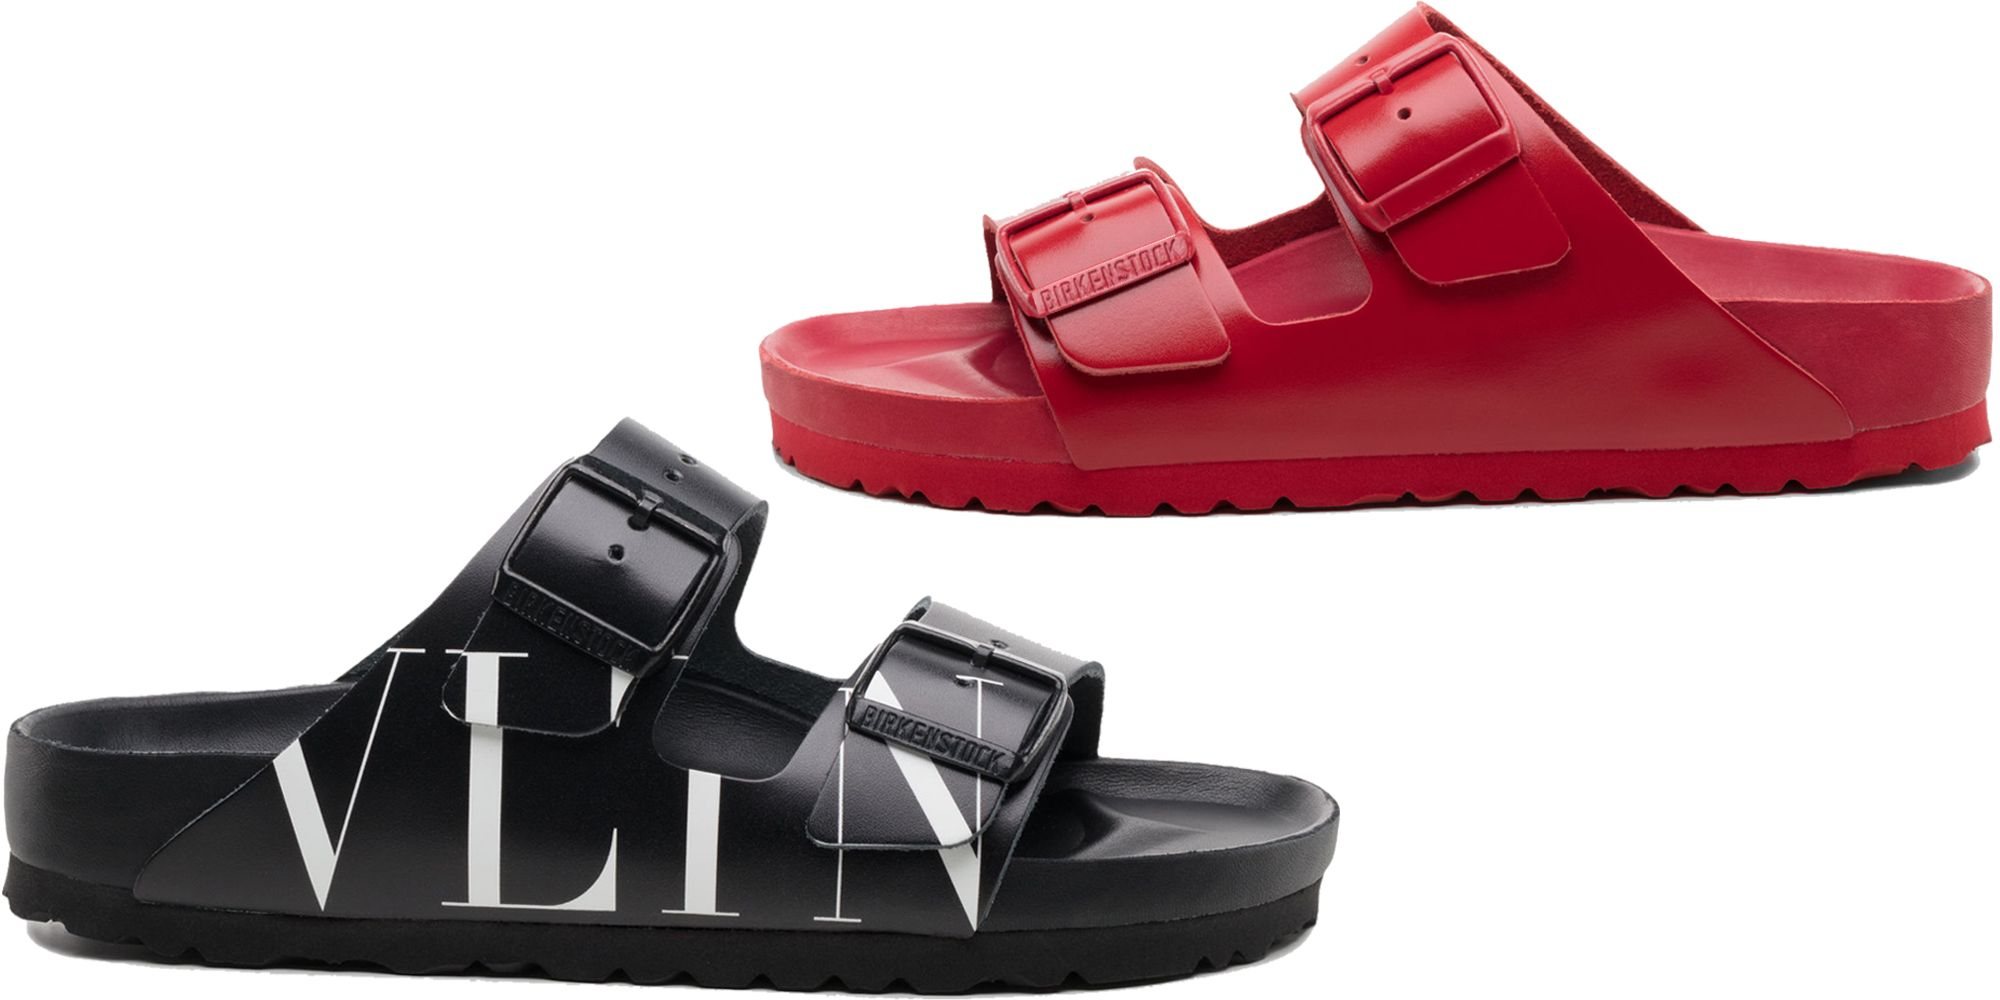 Valentino x Birkenstock Sandals Are Now